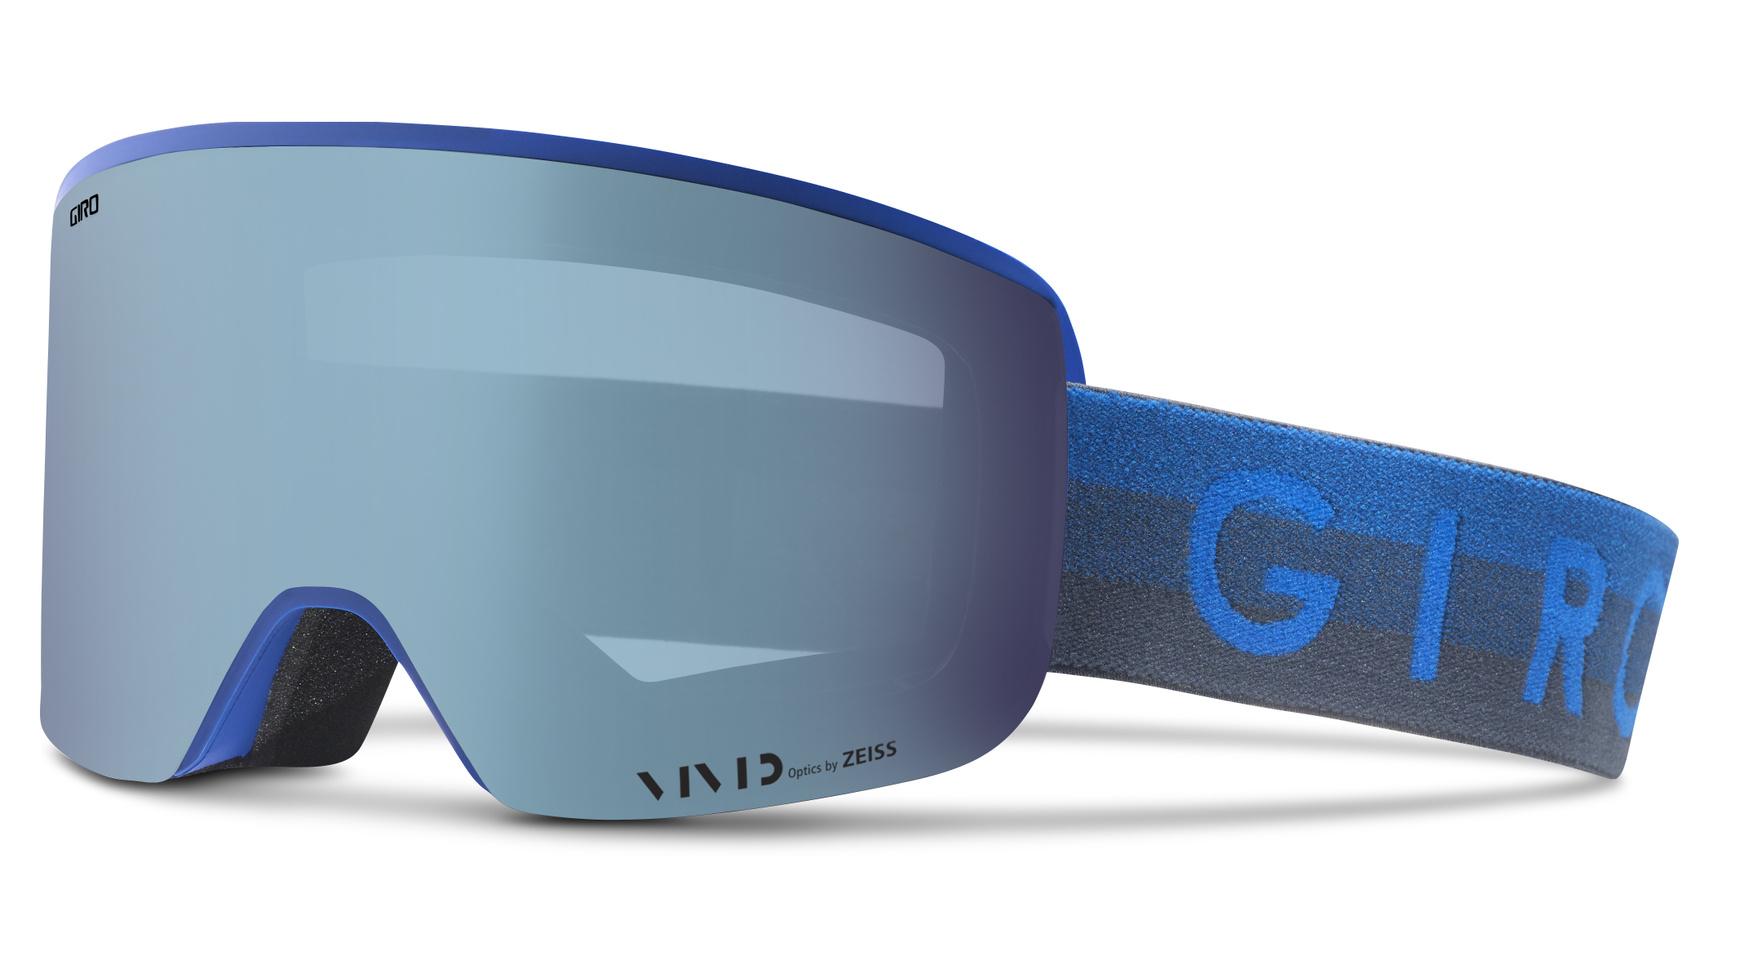 300054005-giro_g_axis_bluehorizon_vividroyal